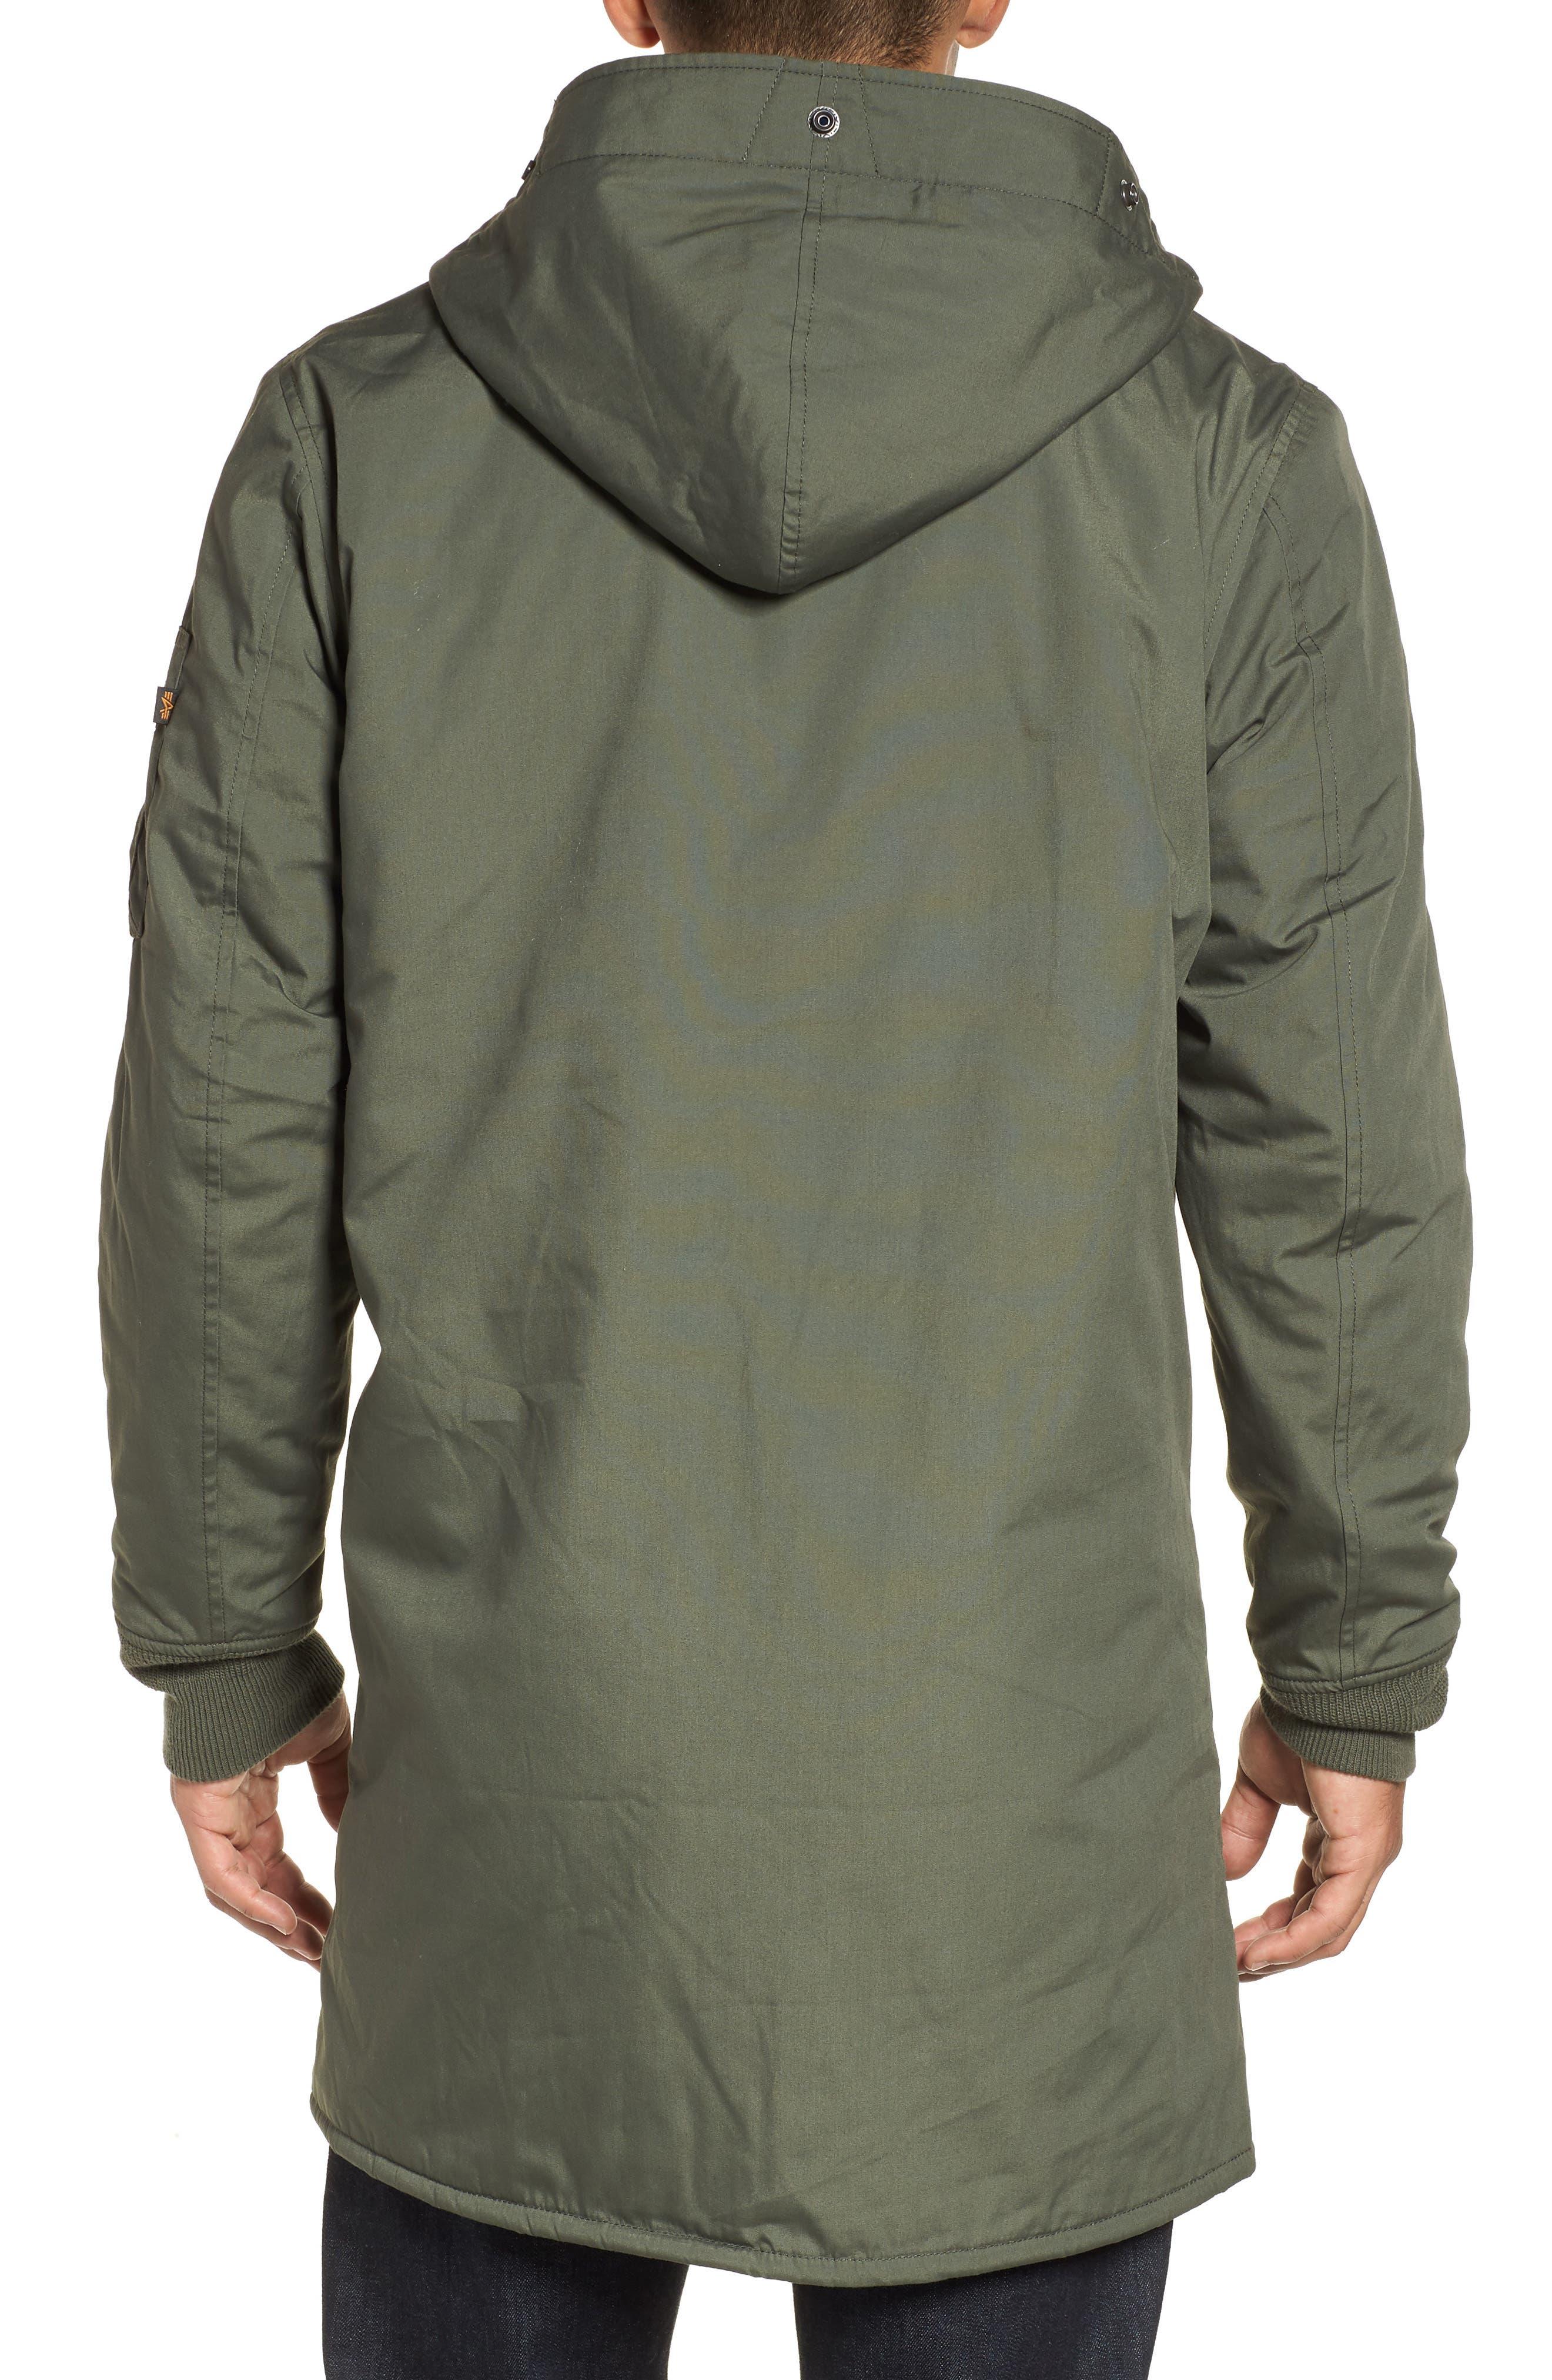 M-47 Faux Shearling Reversible Jacket,                             Alternate thumbnail 2, color,                             M-65 OLIVE